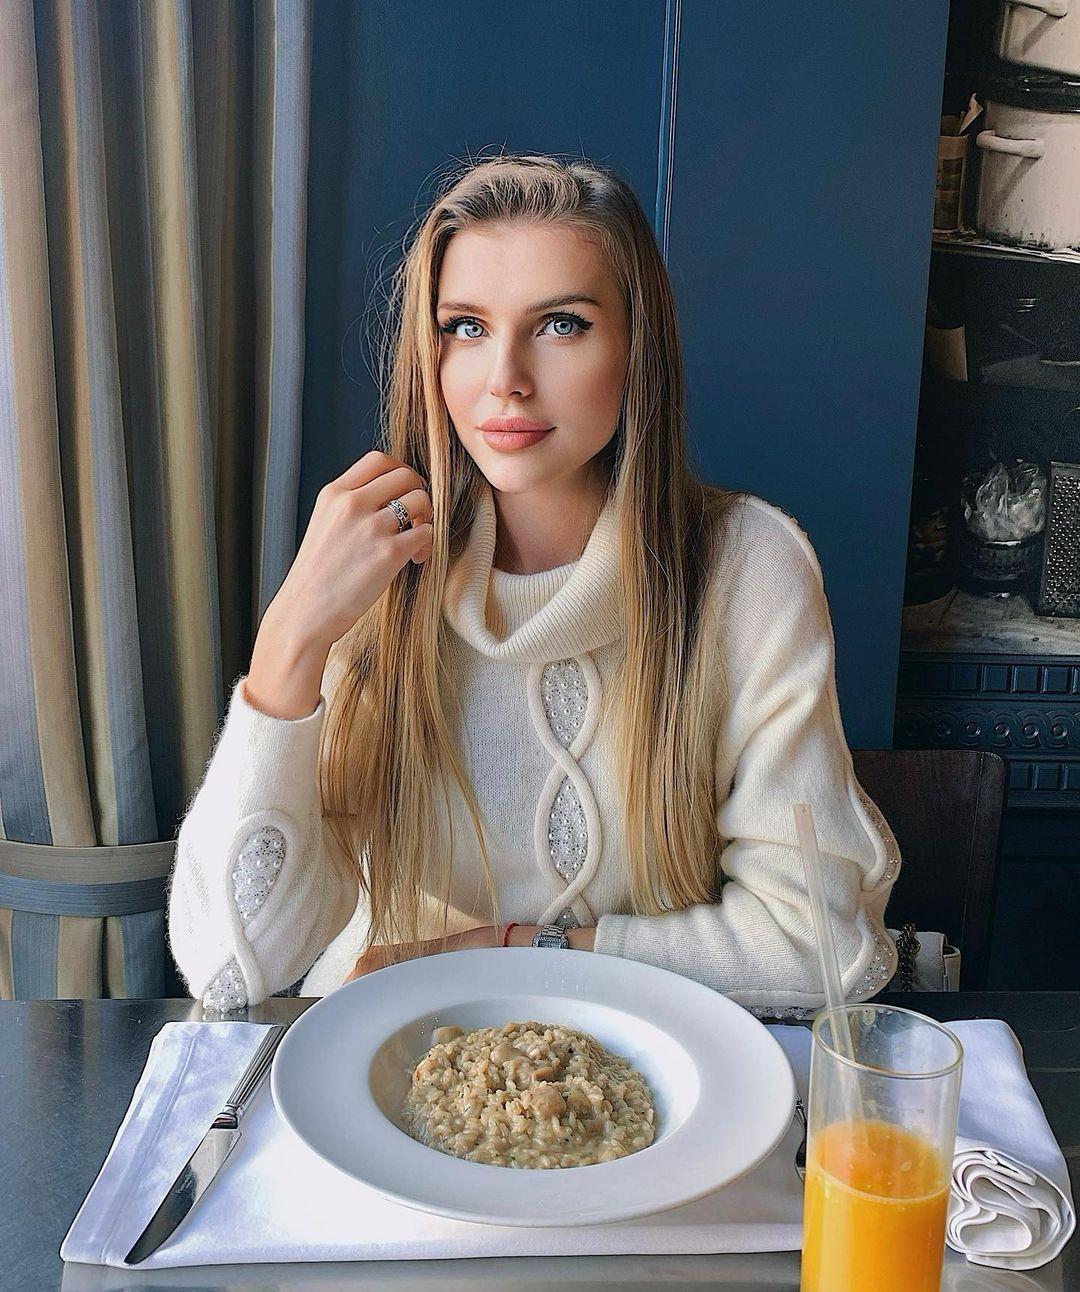 Yuliana-Sholomitskaya-Wallpapers-Insta-Fit-Bio-8